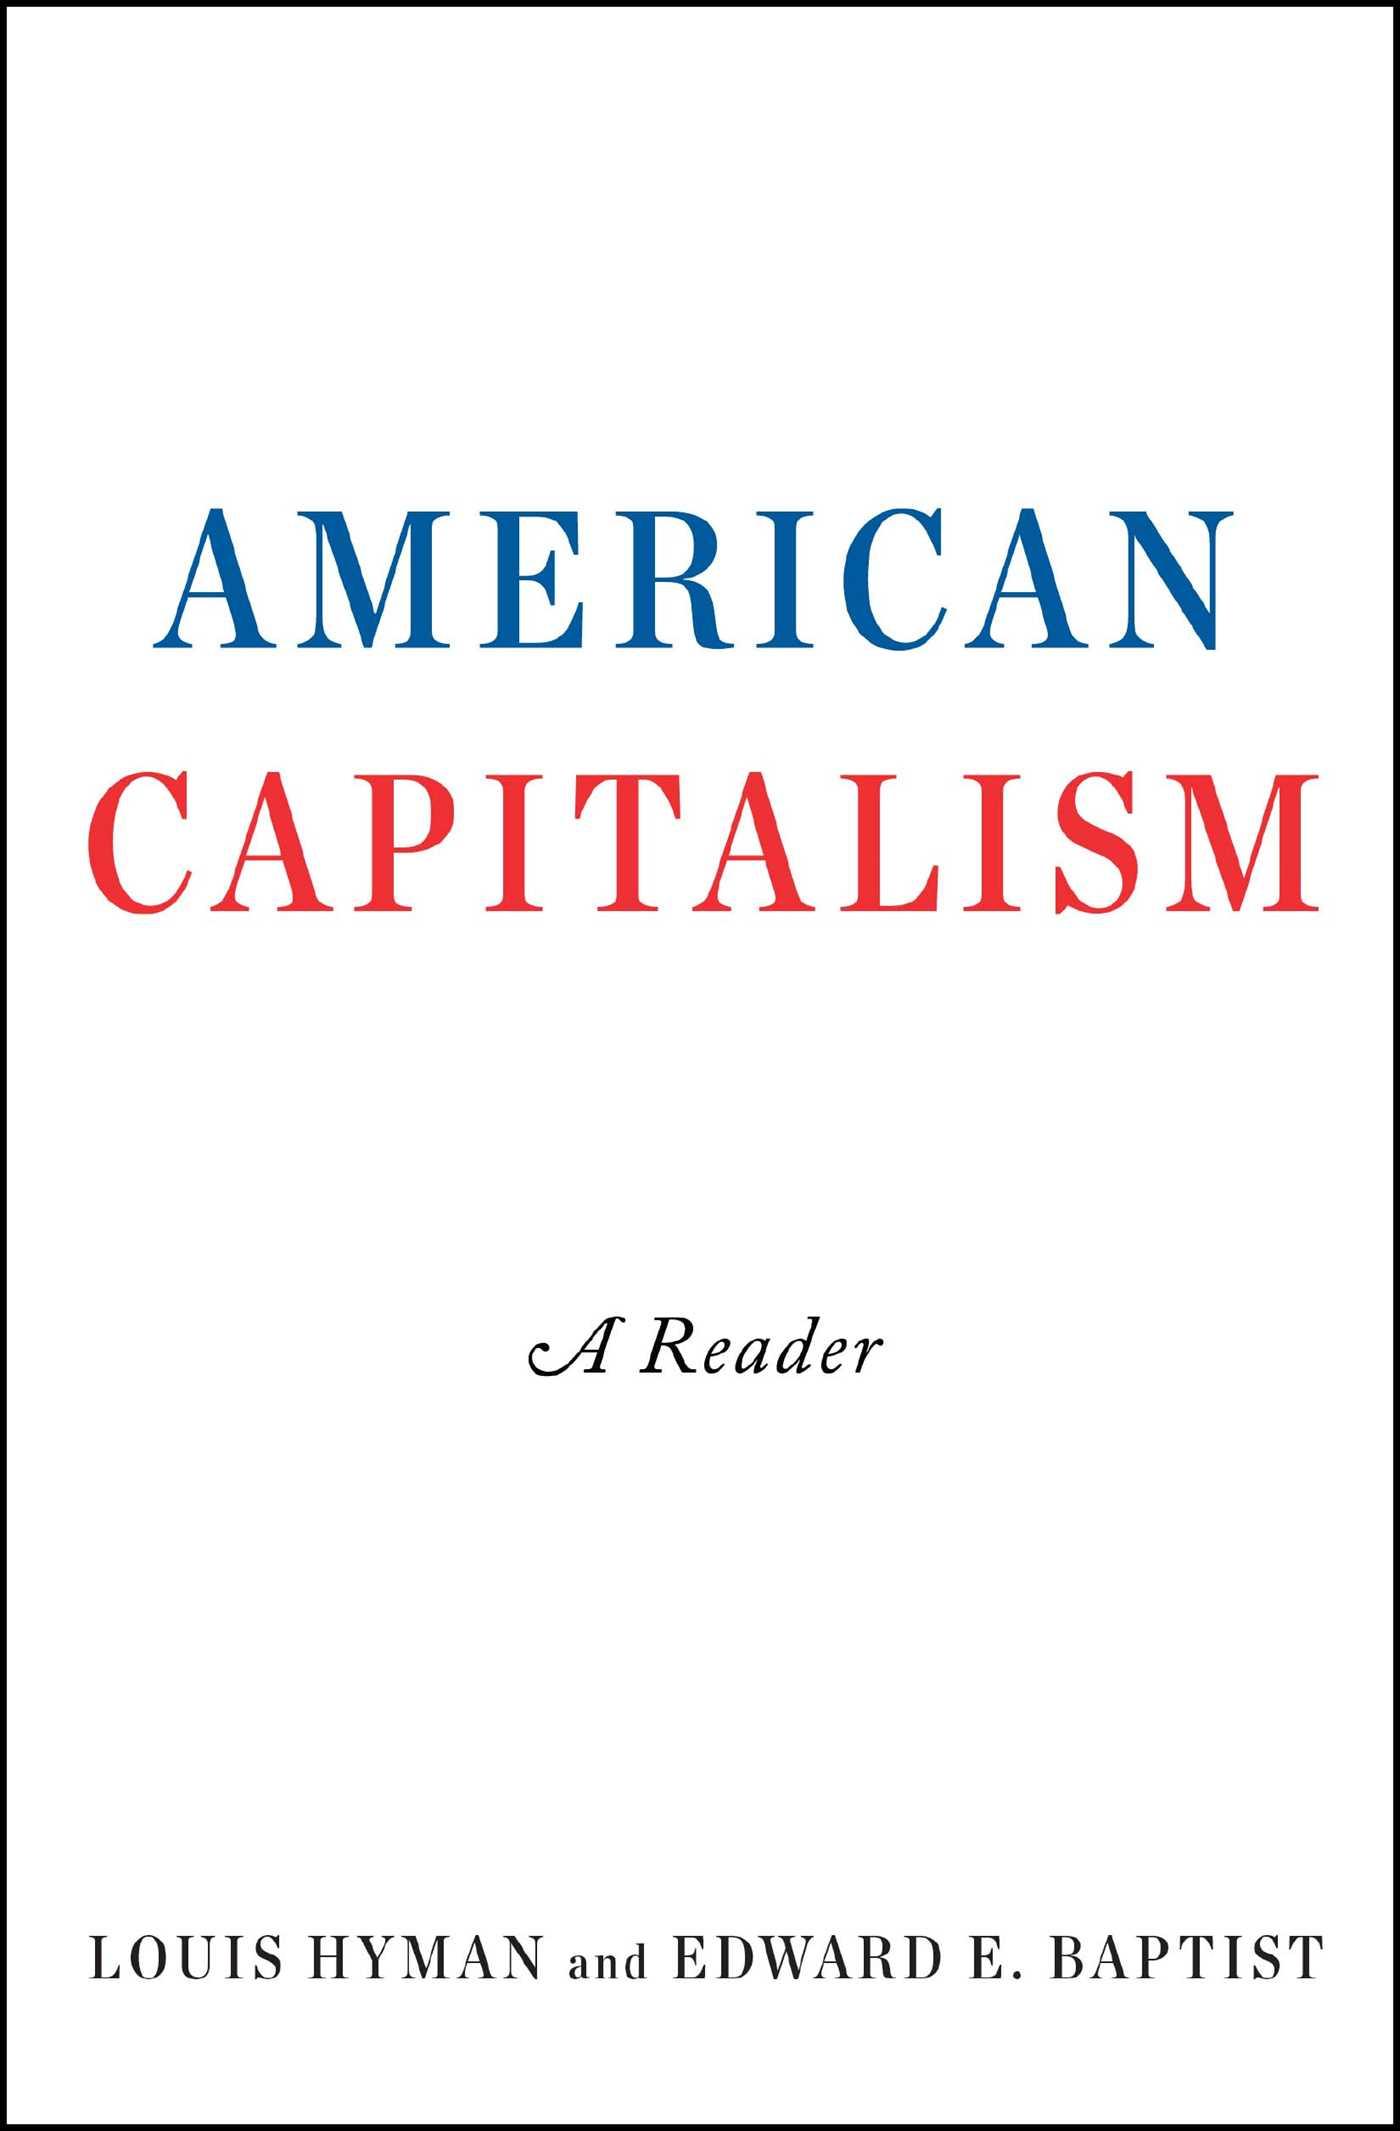 American capitalism 9781501171307 hr